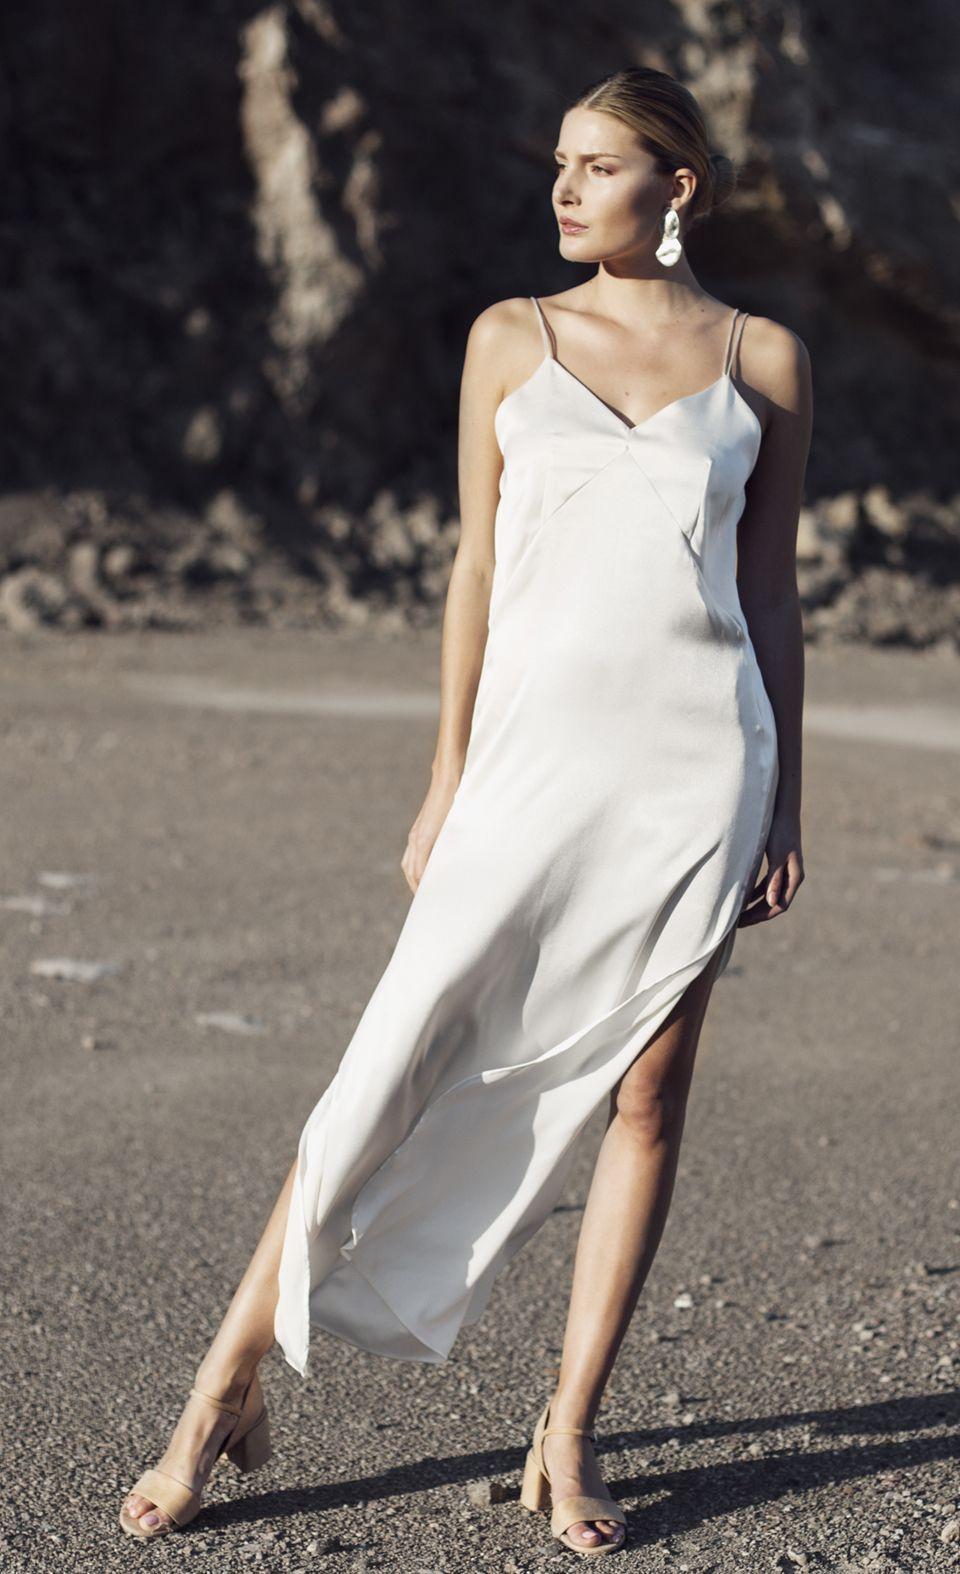 Vestido de novia sleepdress. Modelo Lunance geométrica. Disponible en Womance.es